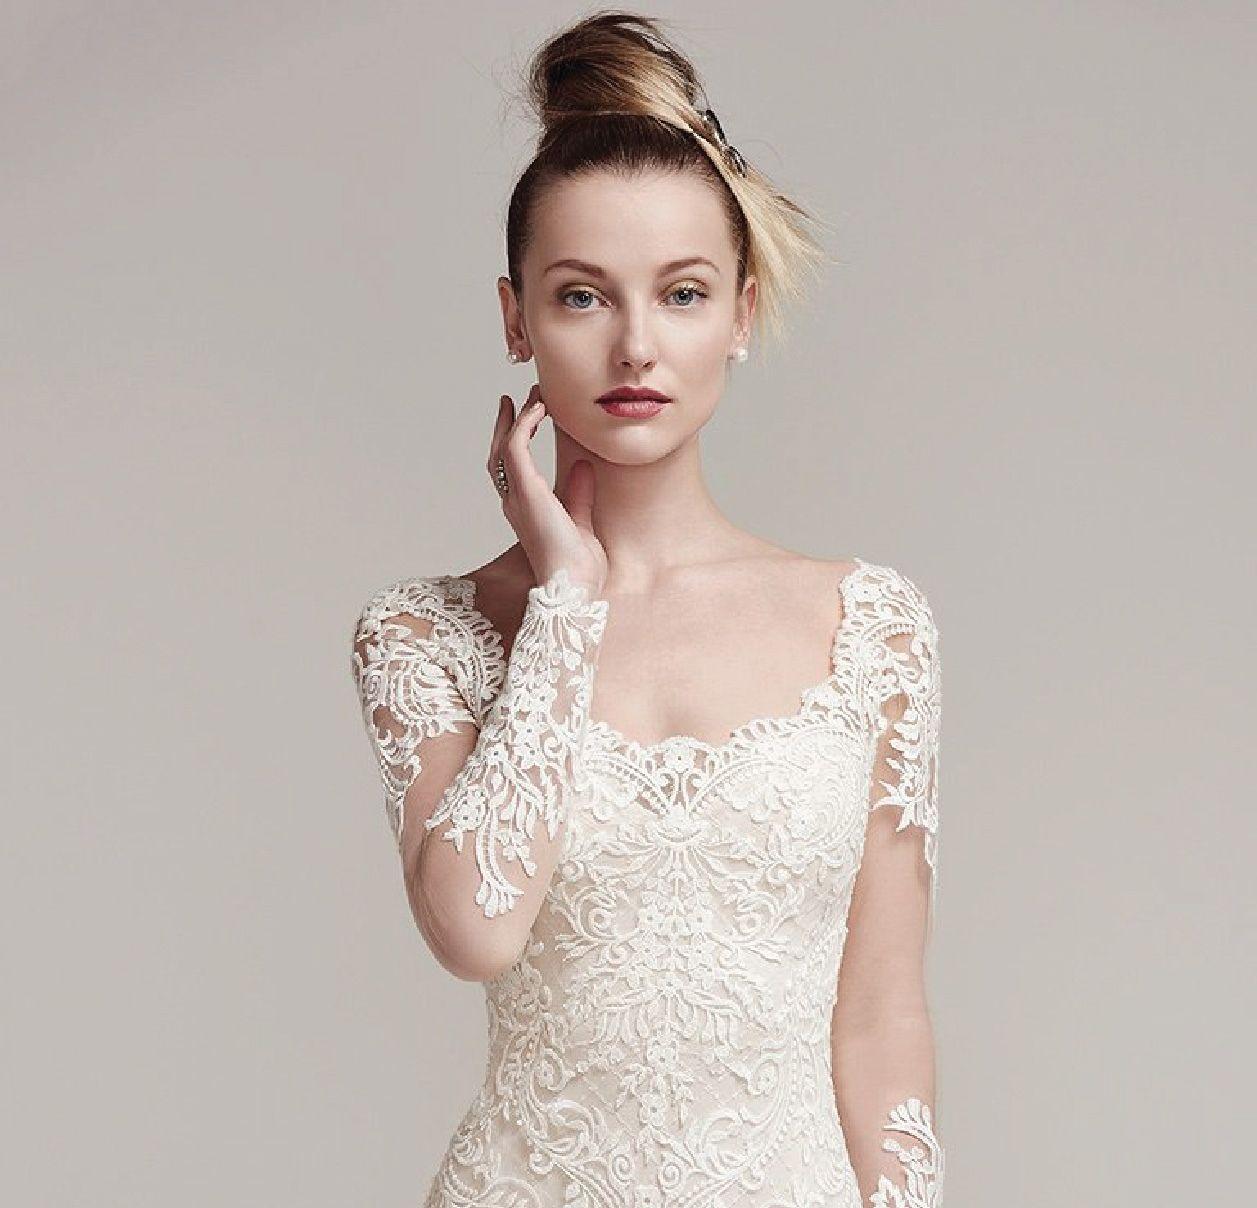 99+ Armadale Wedding Dress Shops - Best Wedding Dress for Pear ...